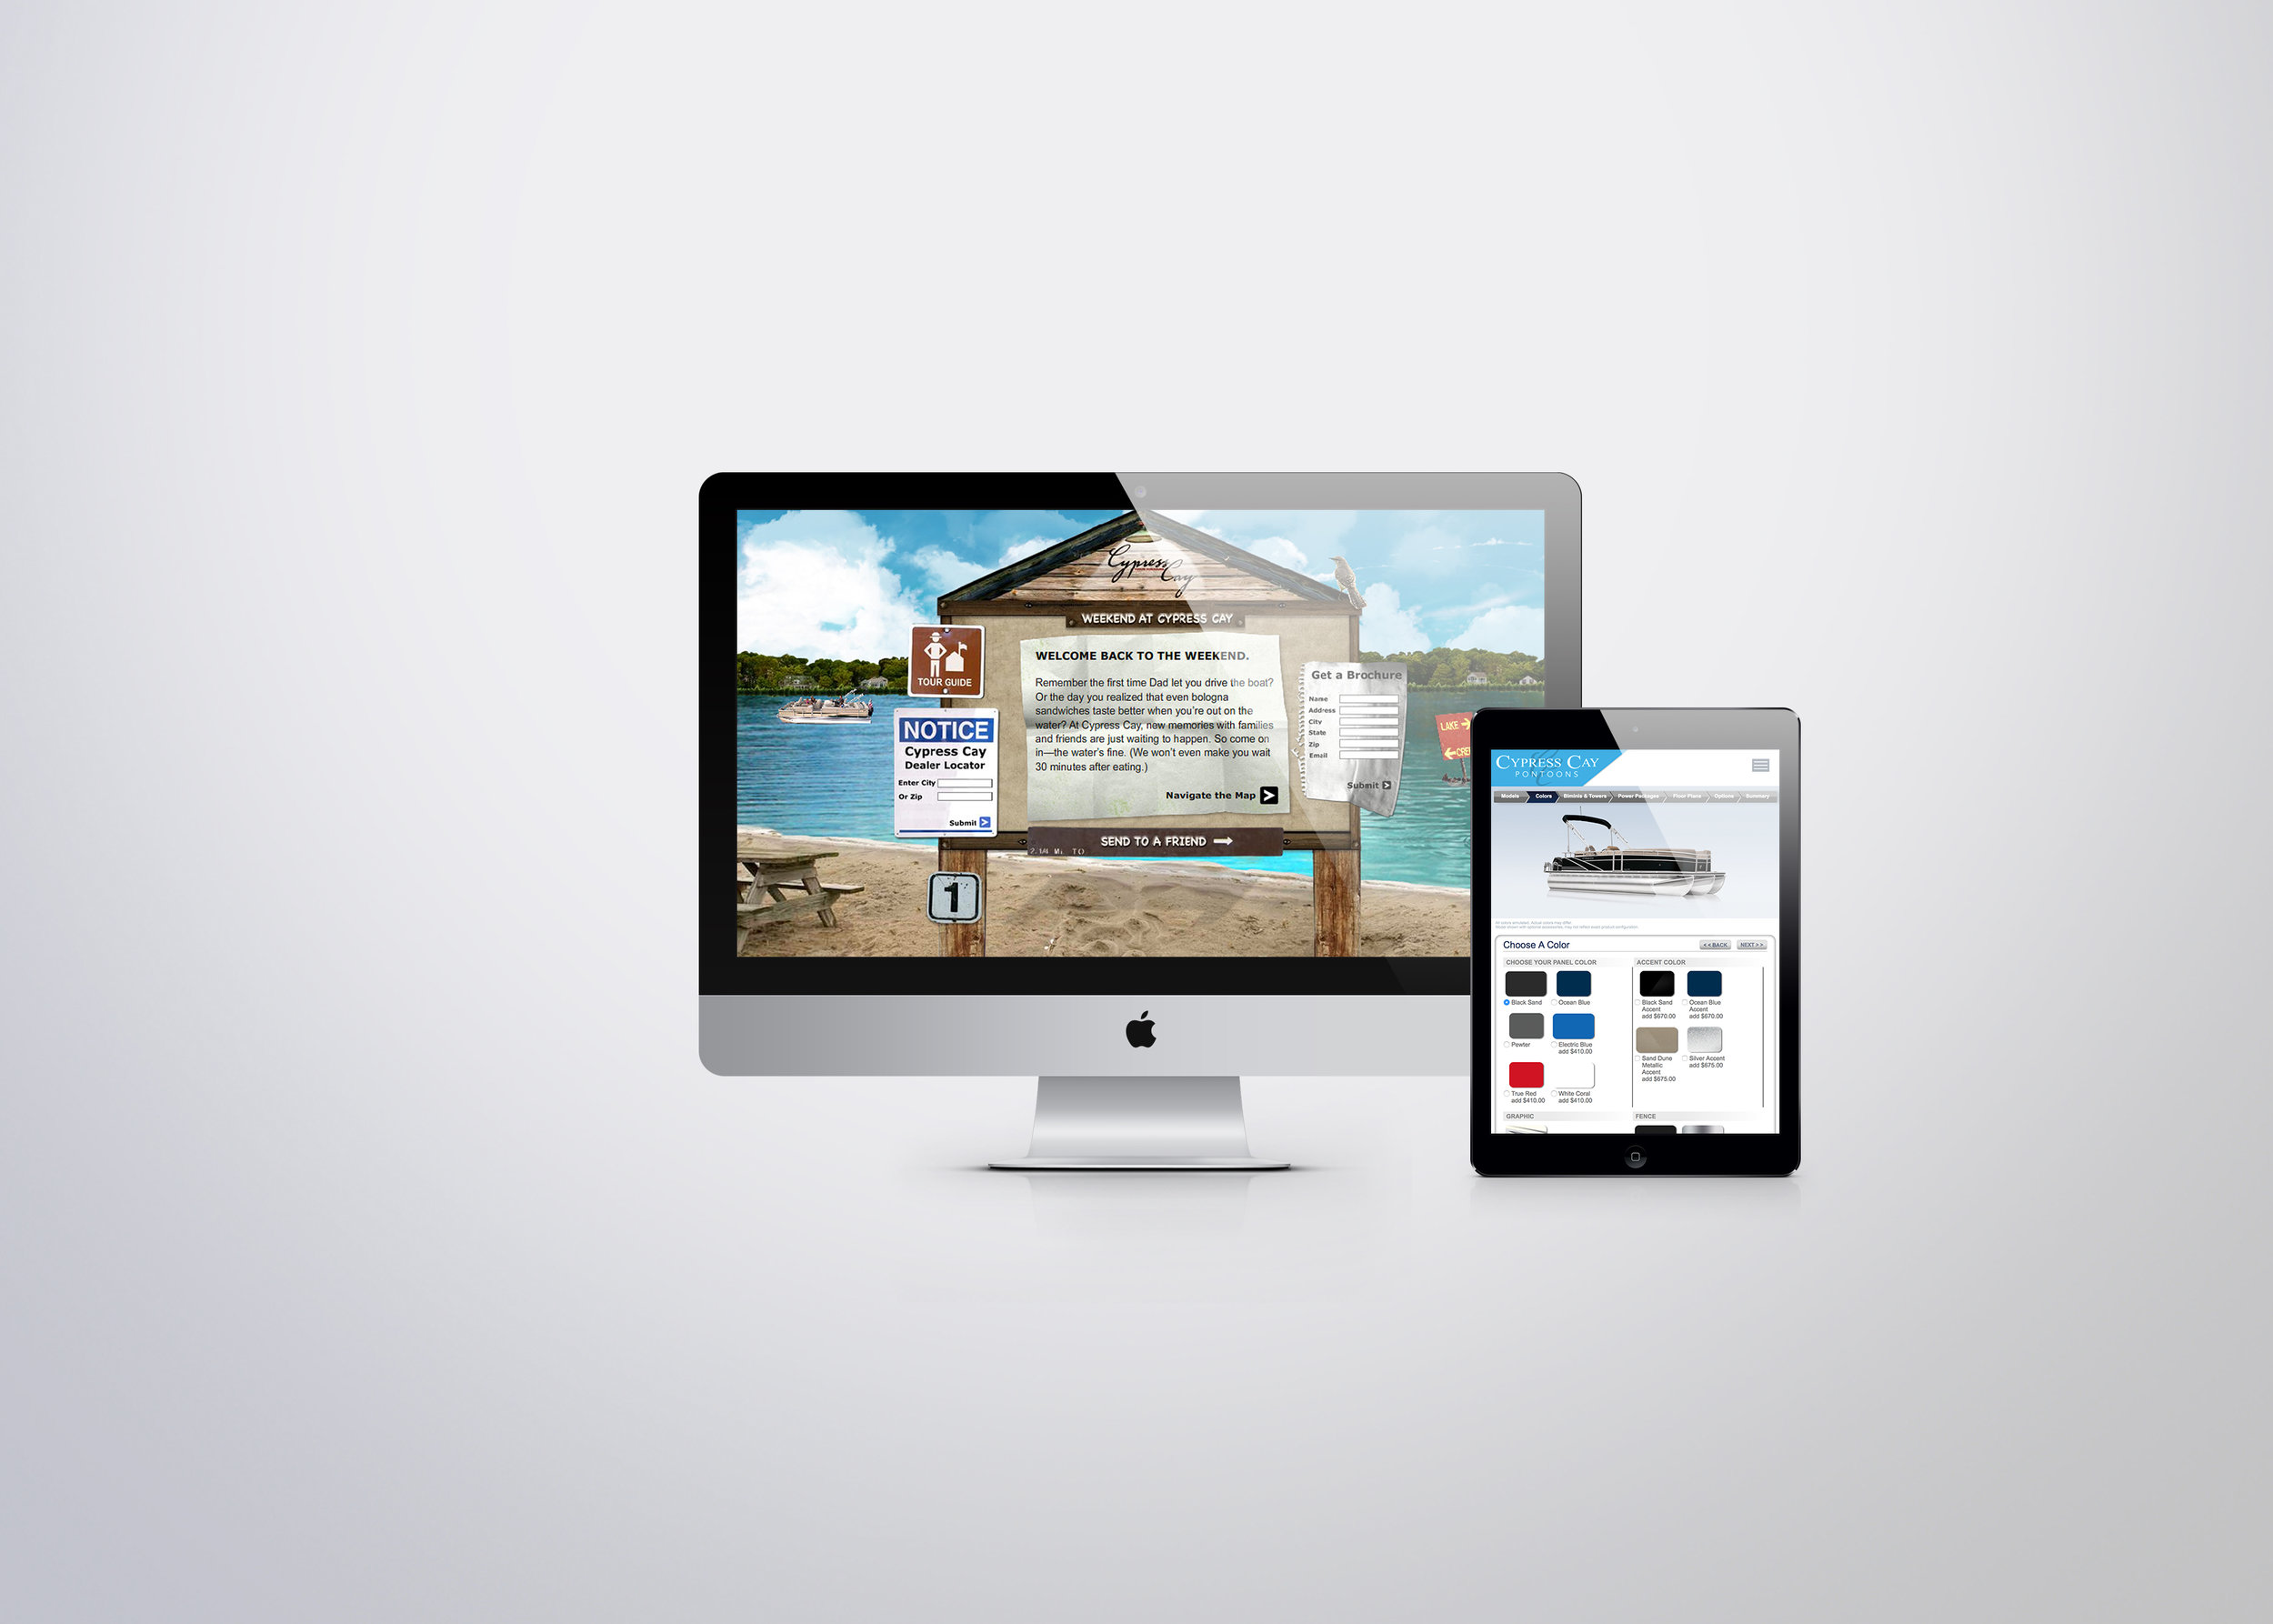 cypresscay_website.jpg